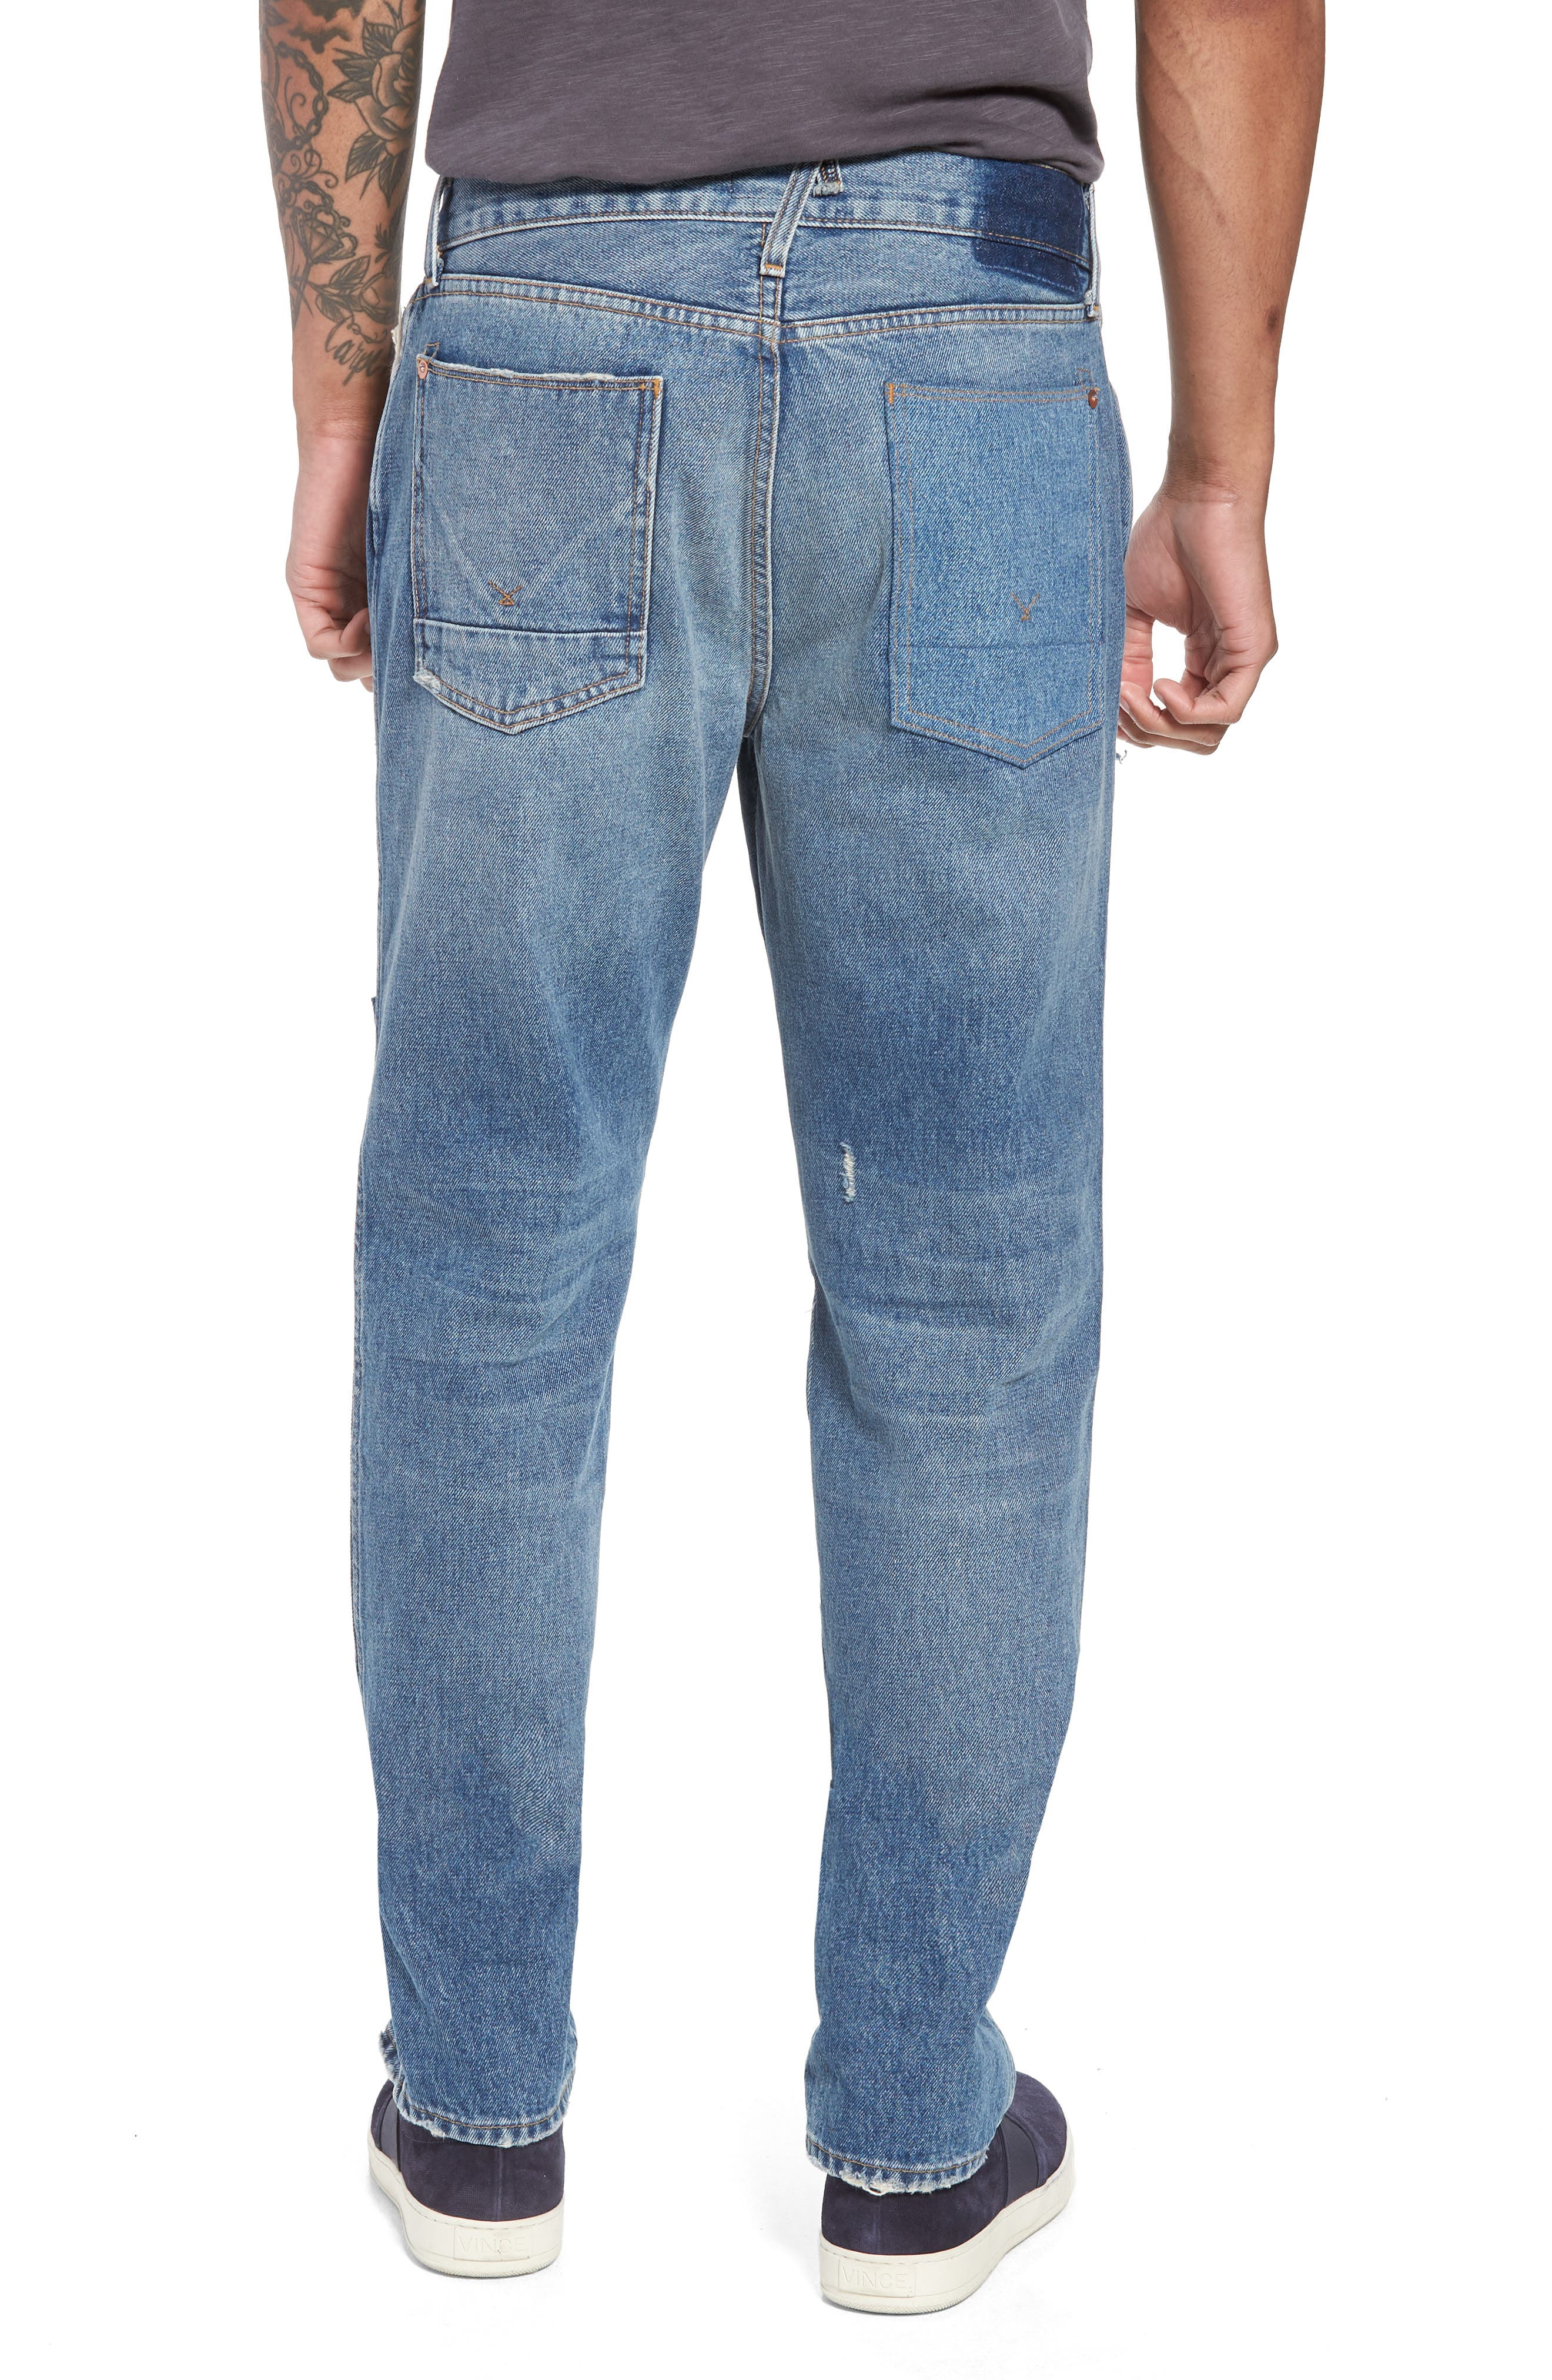 Dixon Straight Leg Jeans,                             Alternate thumbnail 2, color,                             IRON HEAD